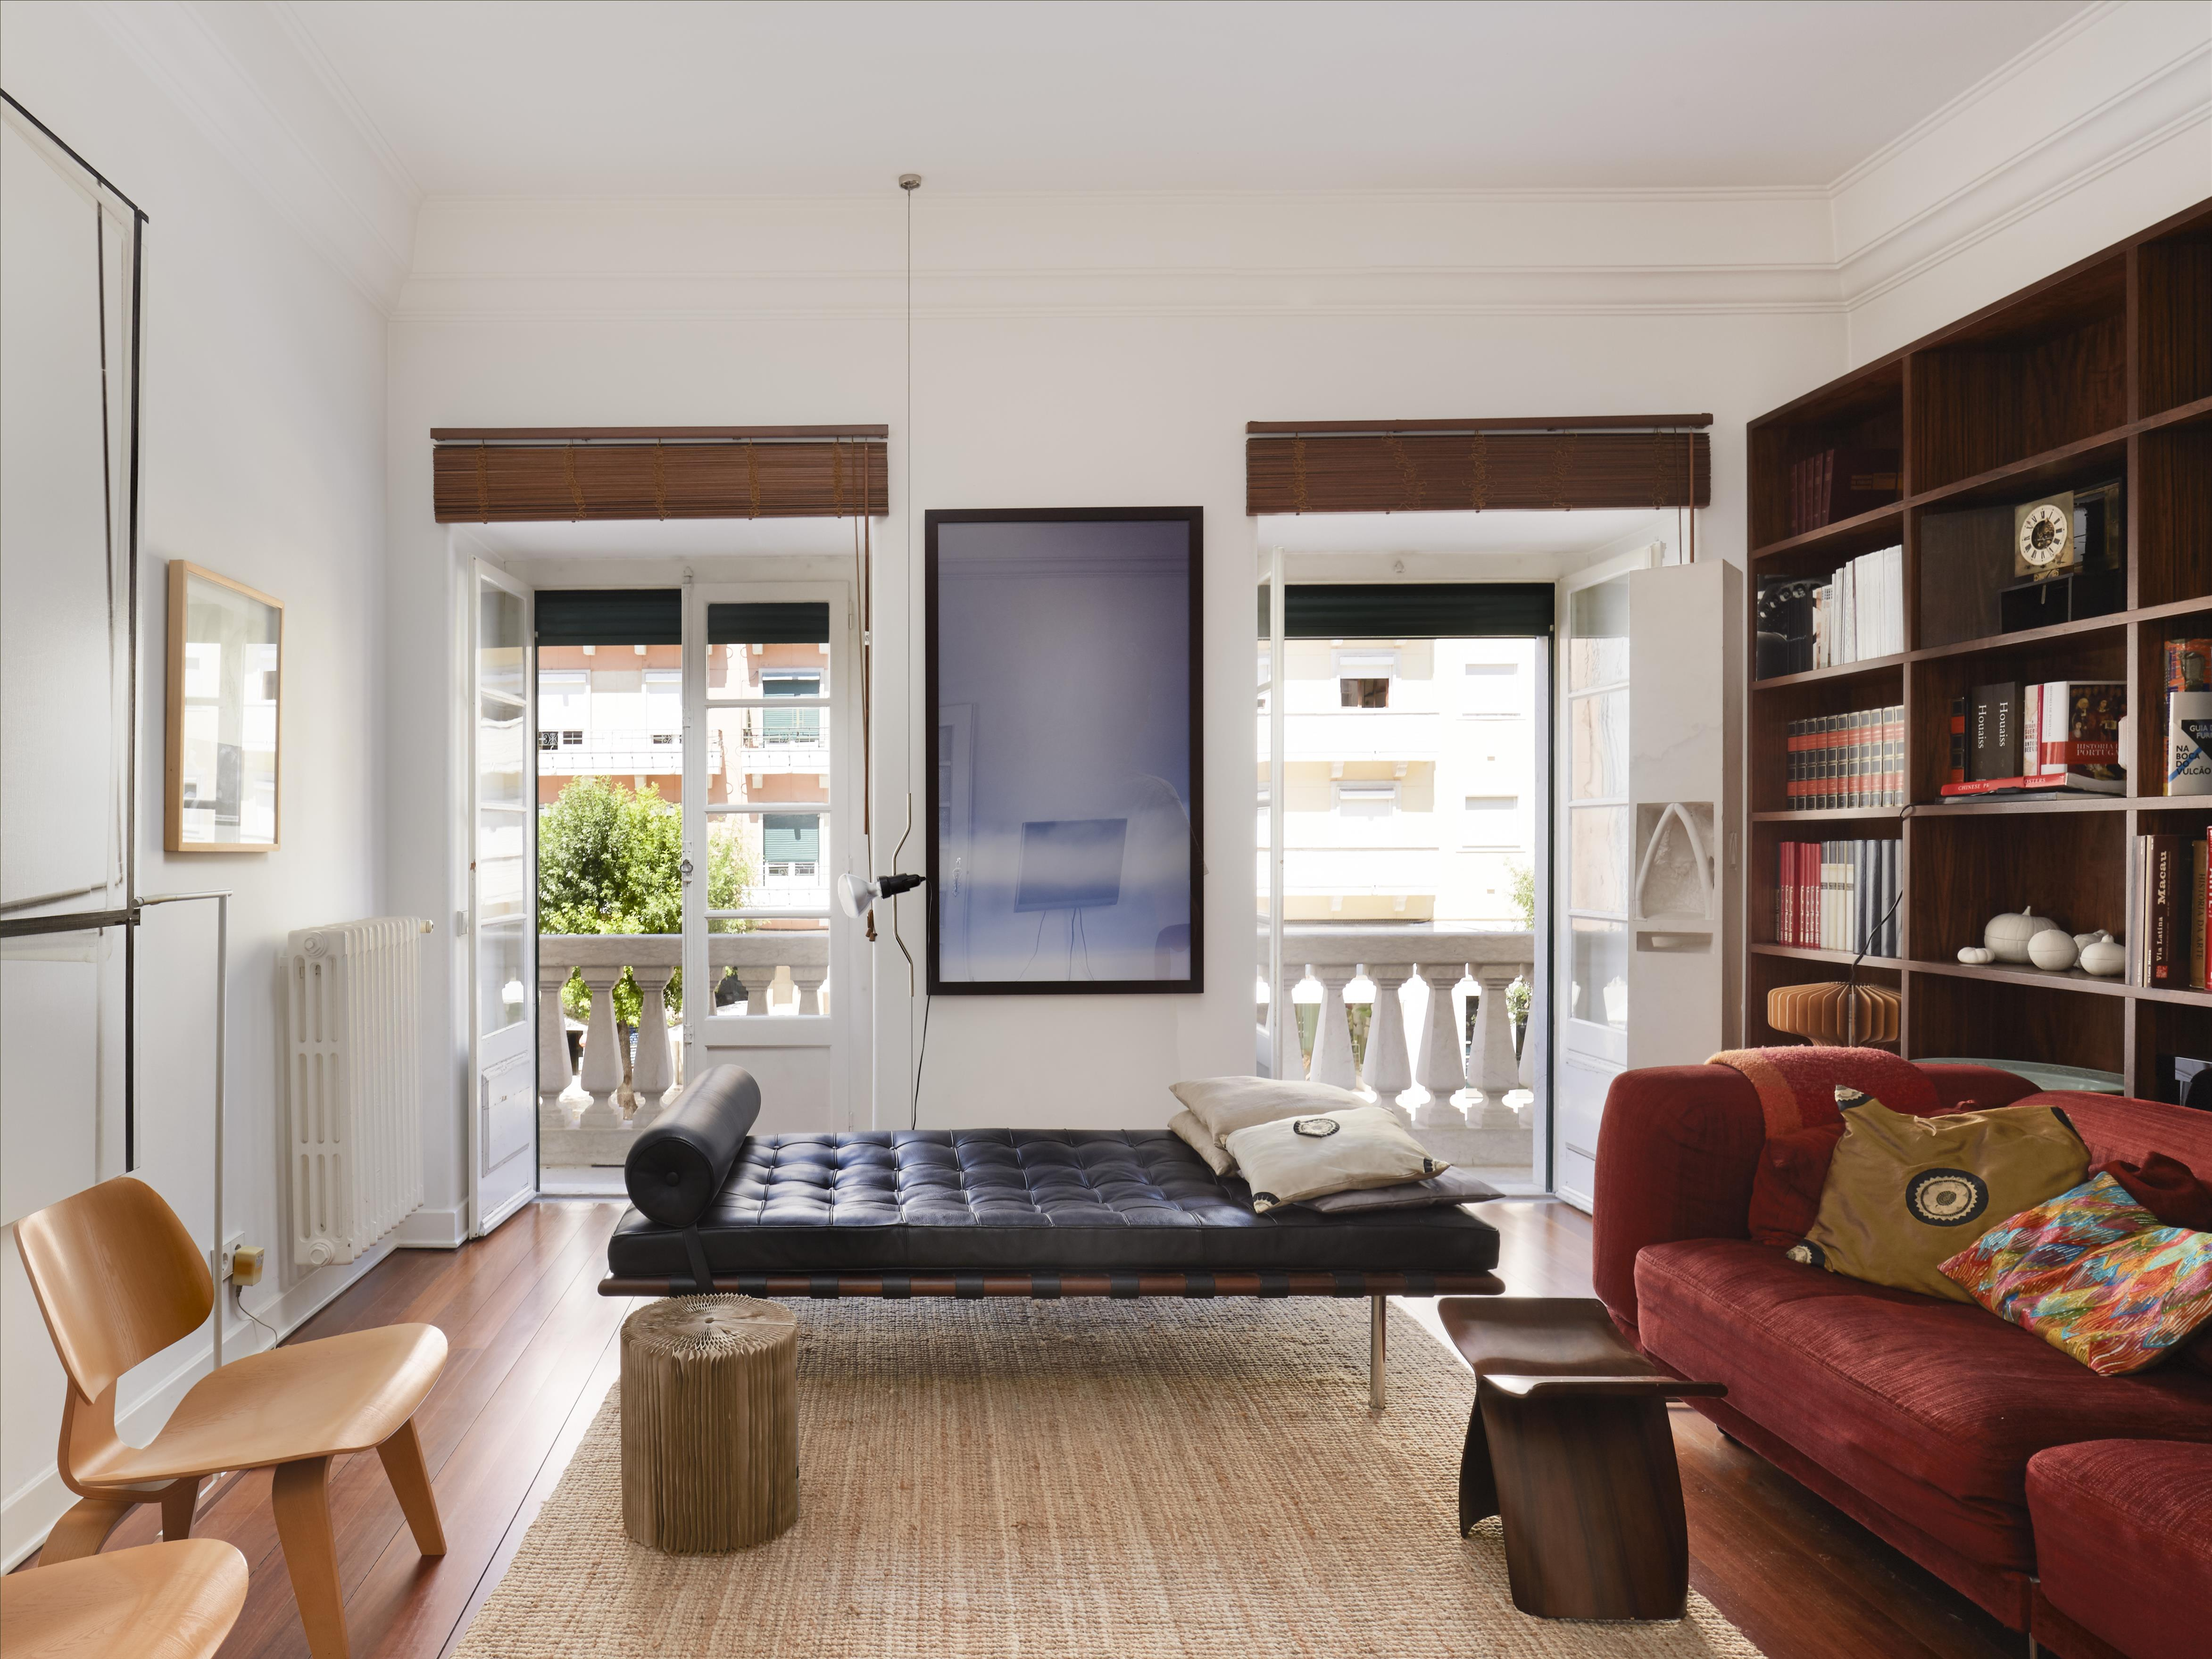 Apartment for Sale at Flat, 3 bedrooms, for Sale Lisboa, Lisboa, - Portugal